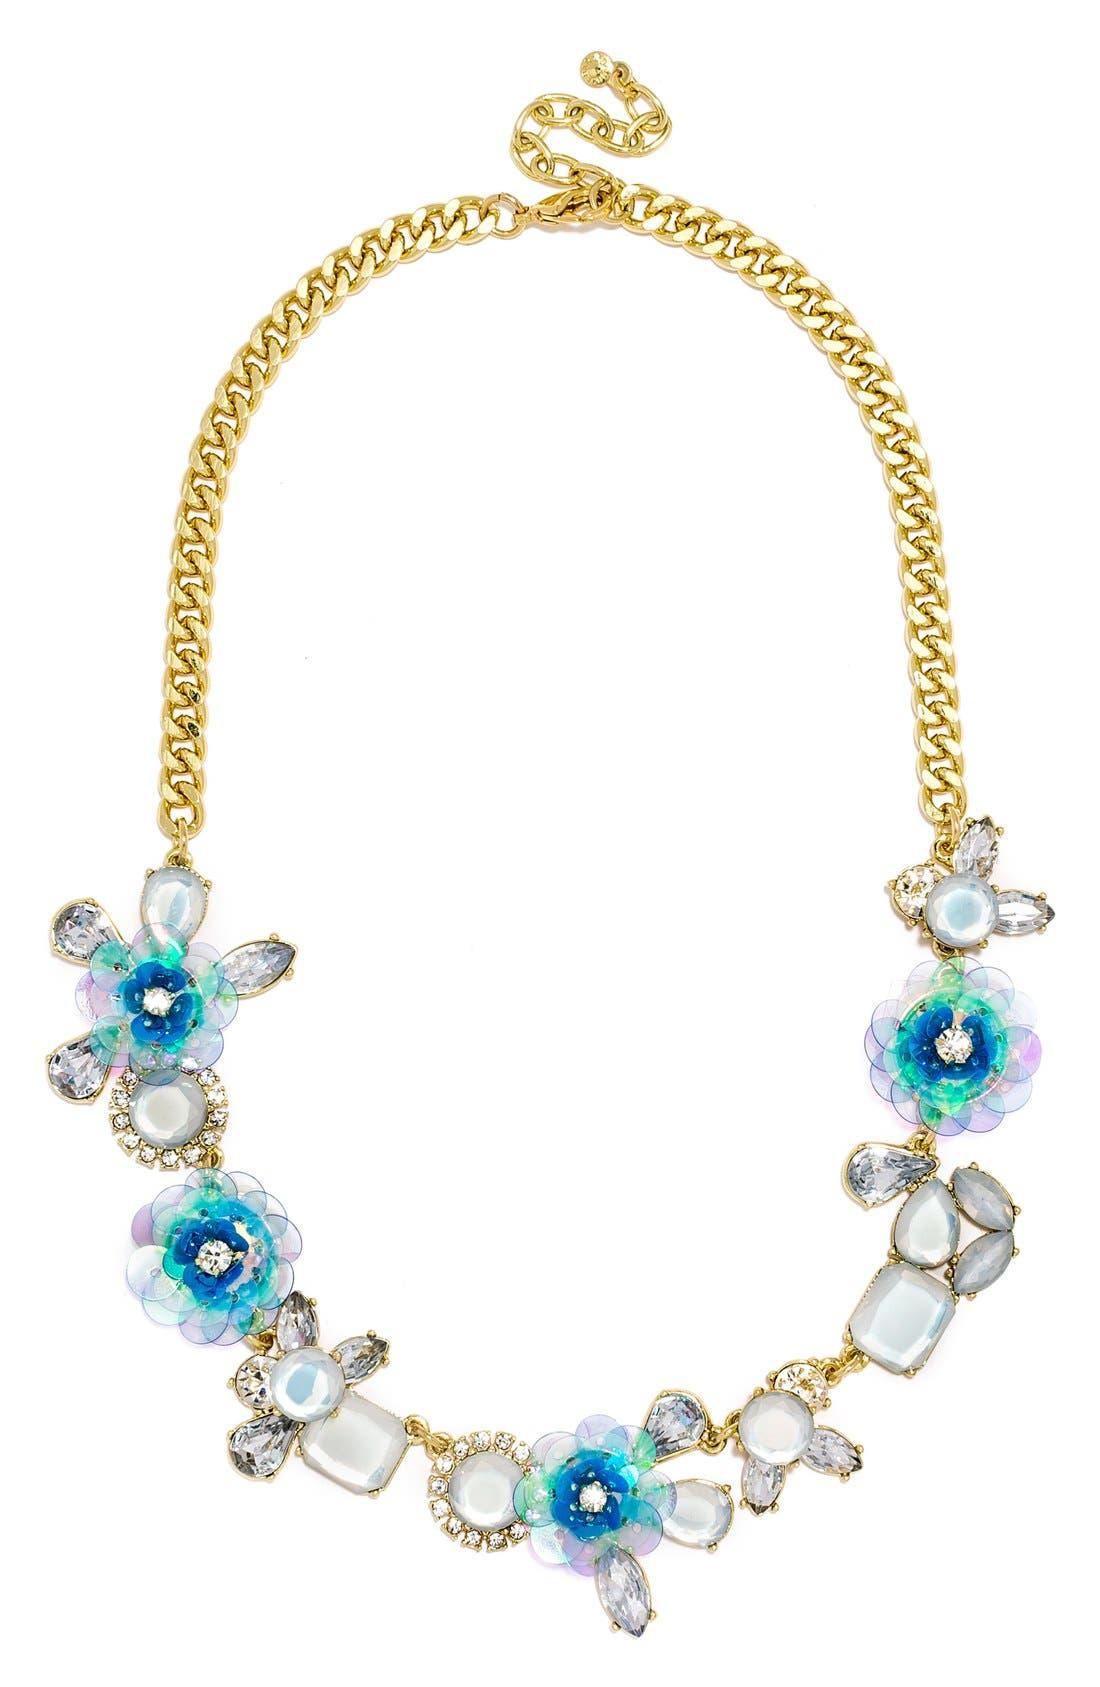 Main Image - BaubleBar 'Kiara' Collar Necklace